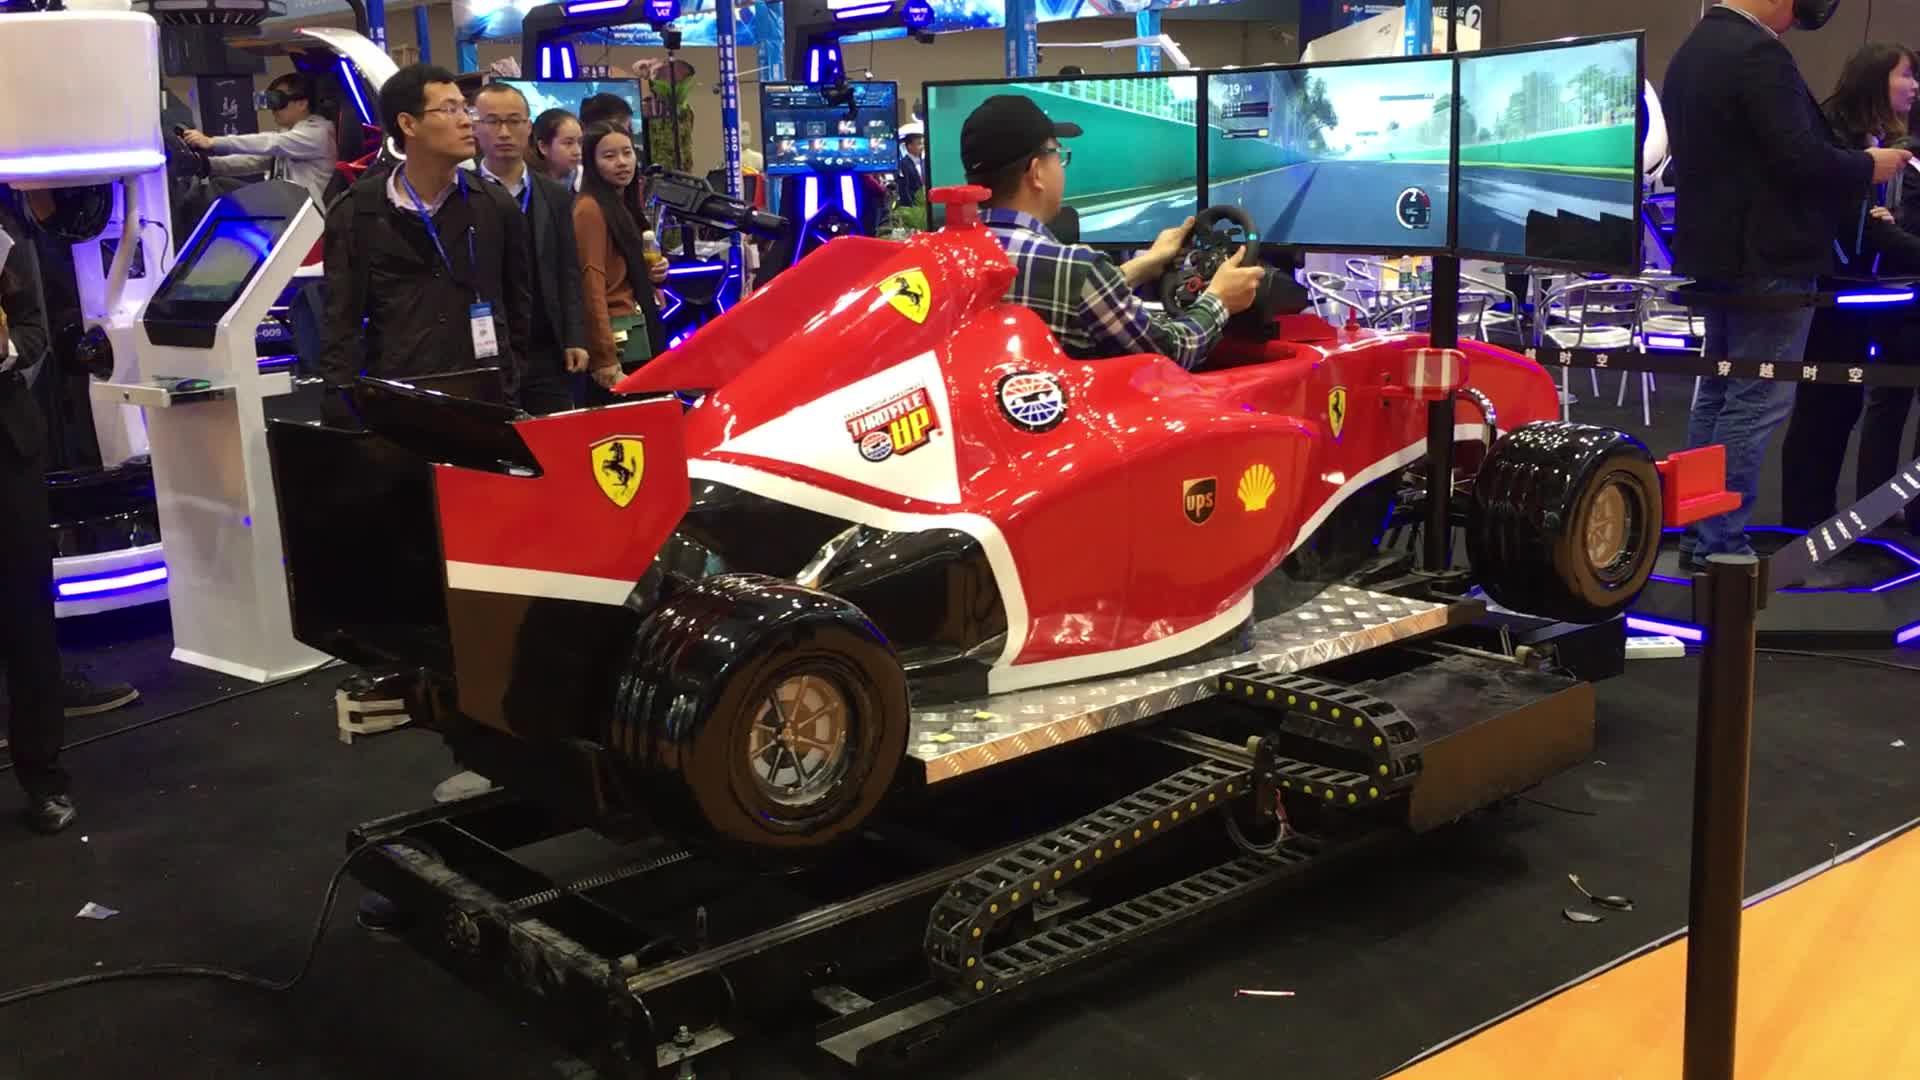 VART VR Attraction Gaming Racing Seat Driving Simulator F1 Car VR Game